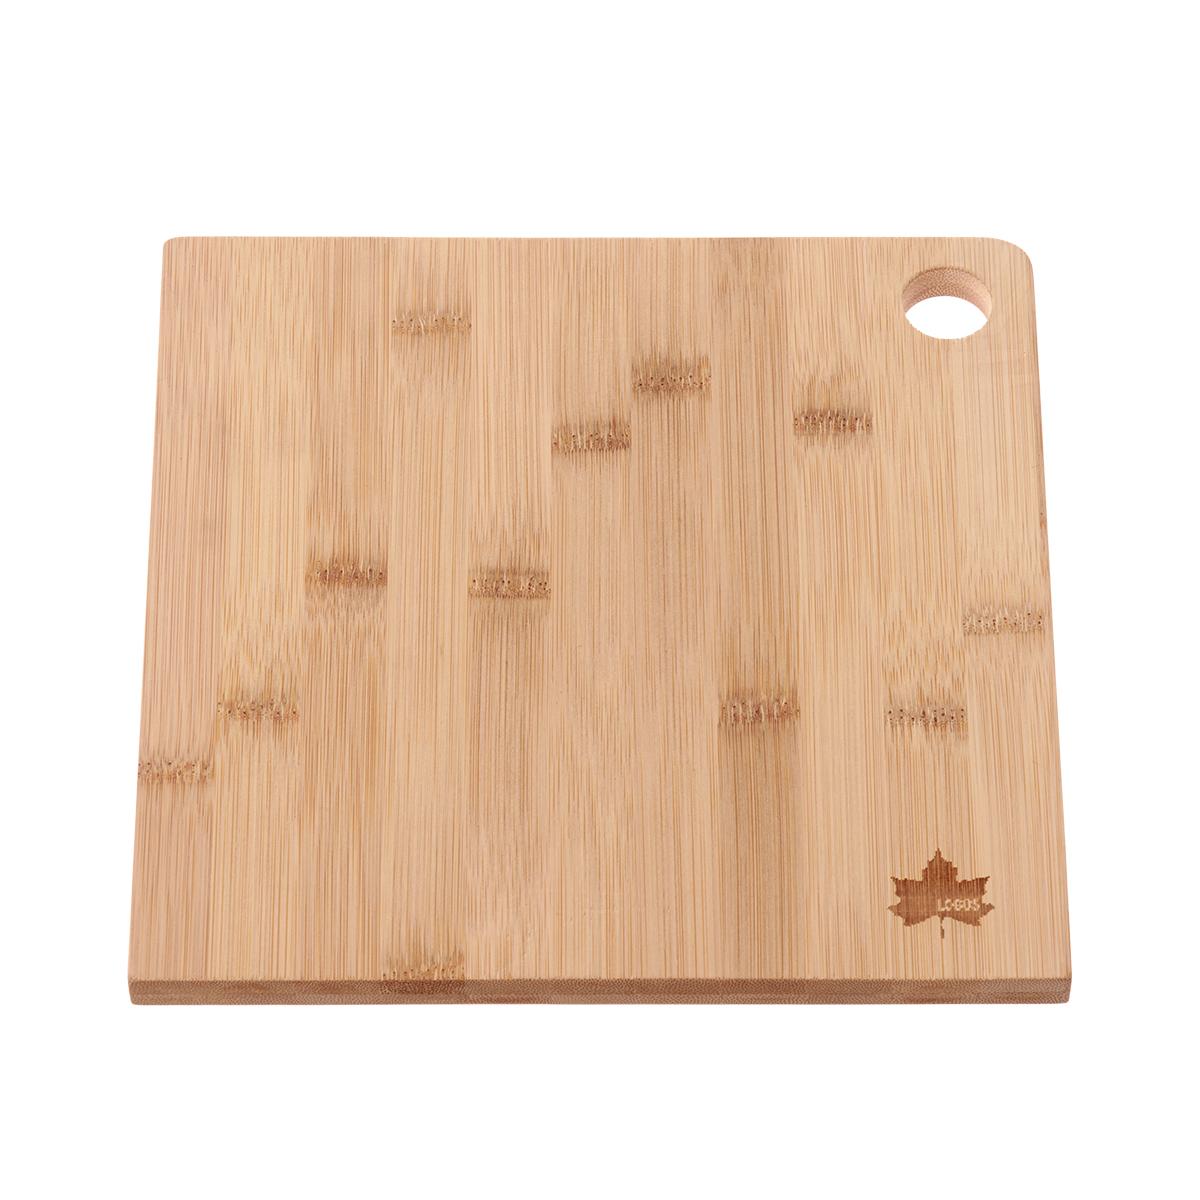 Bamboo ちょっとまな板